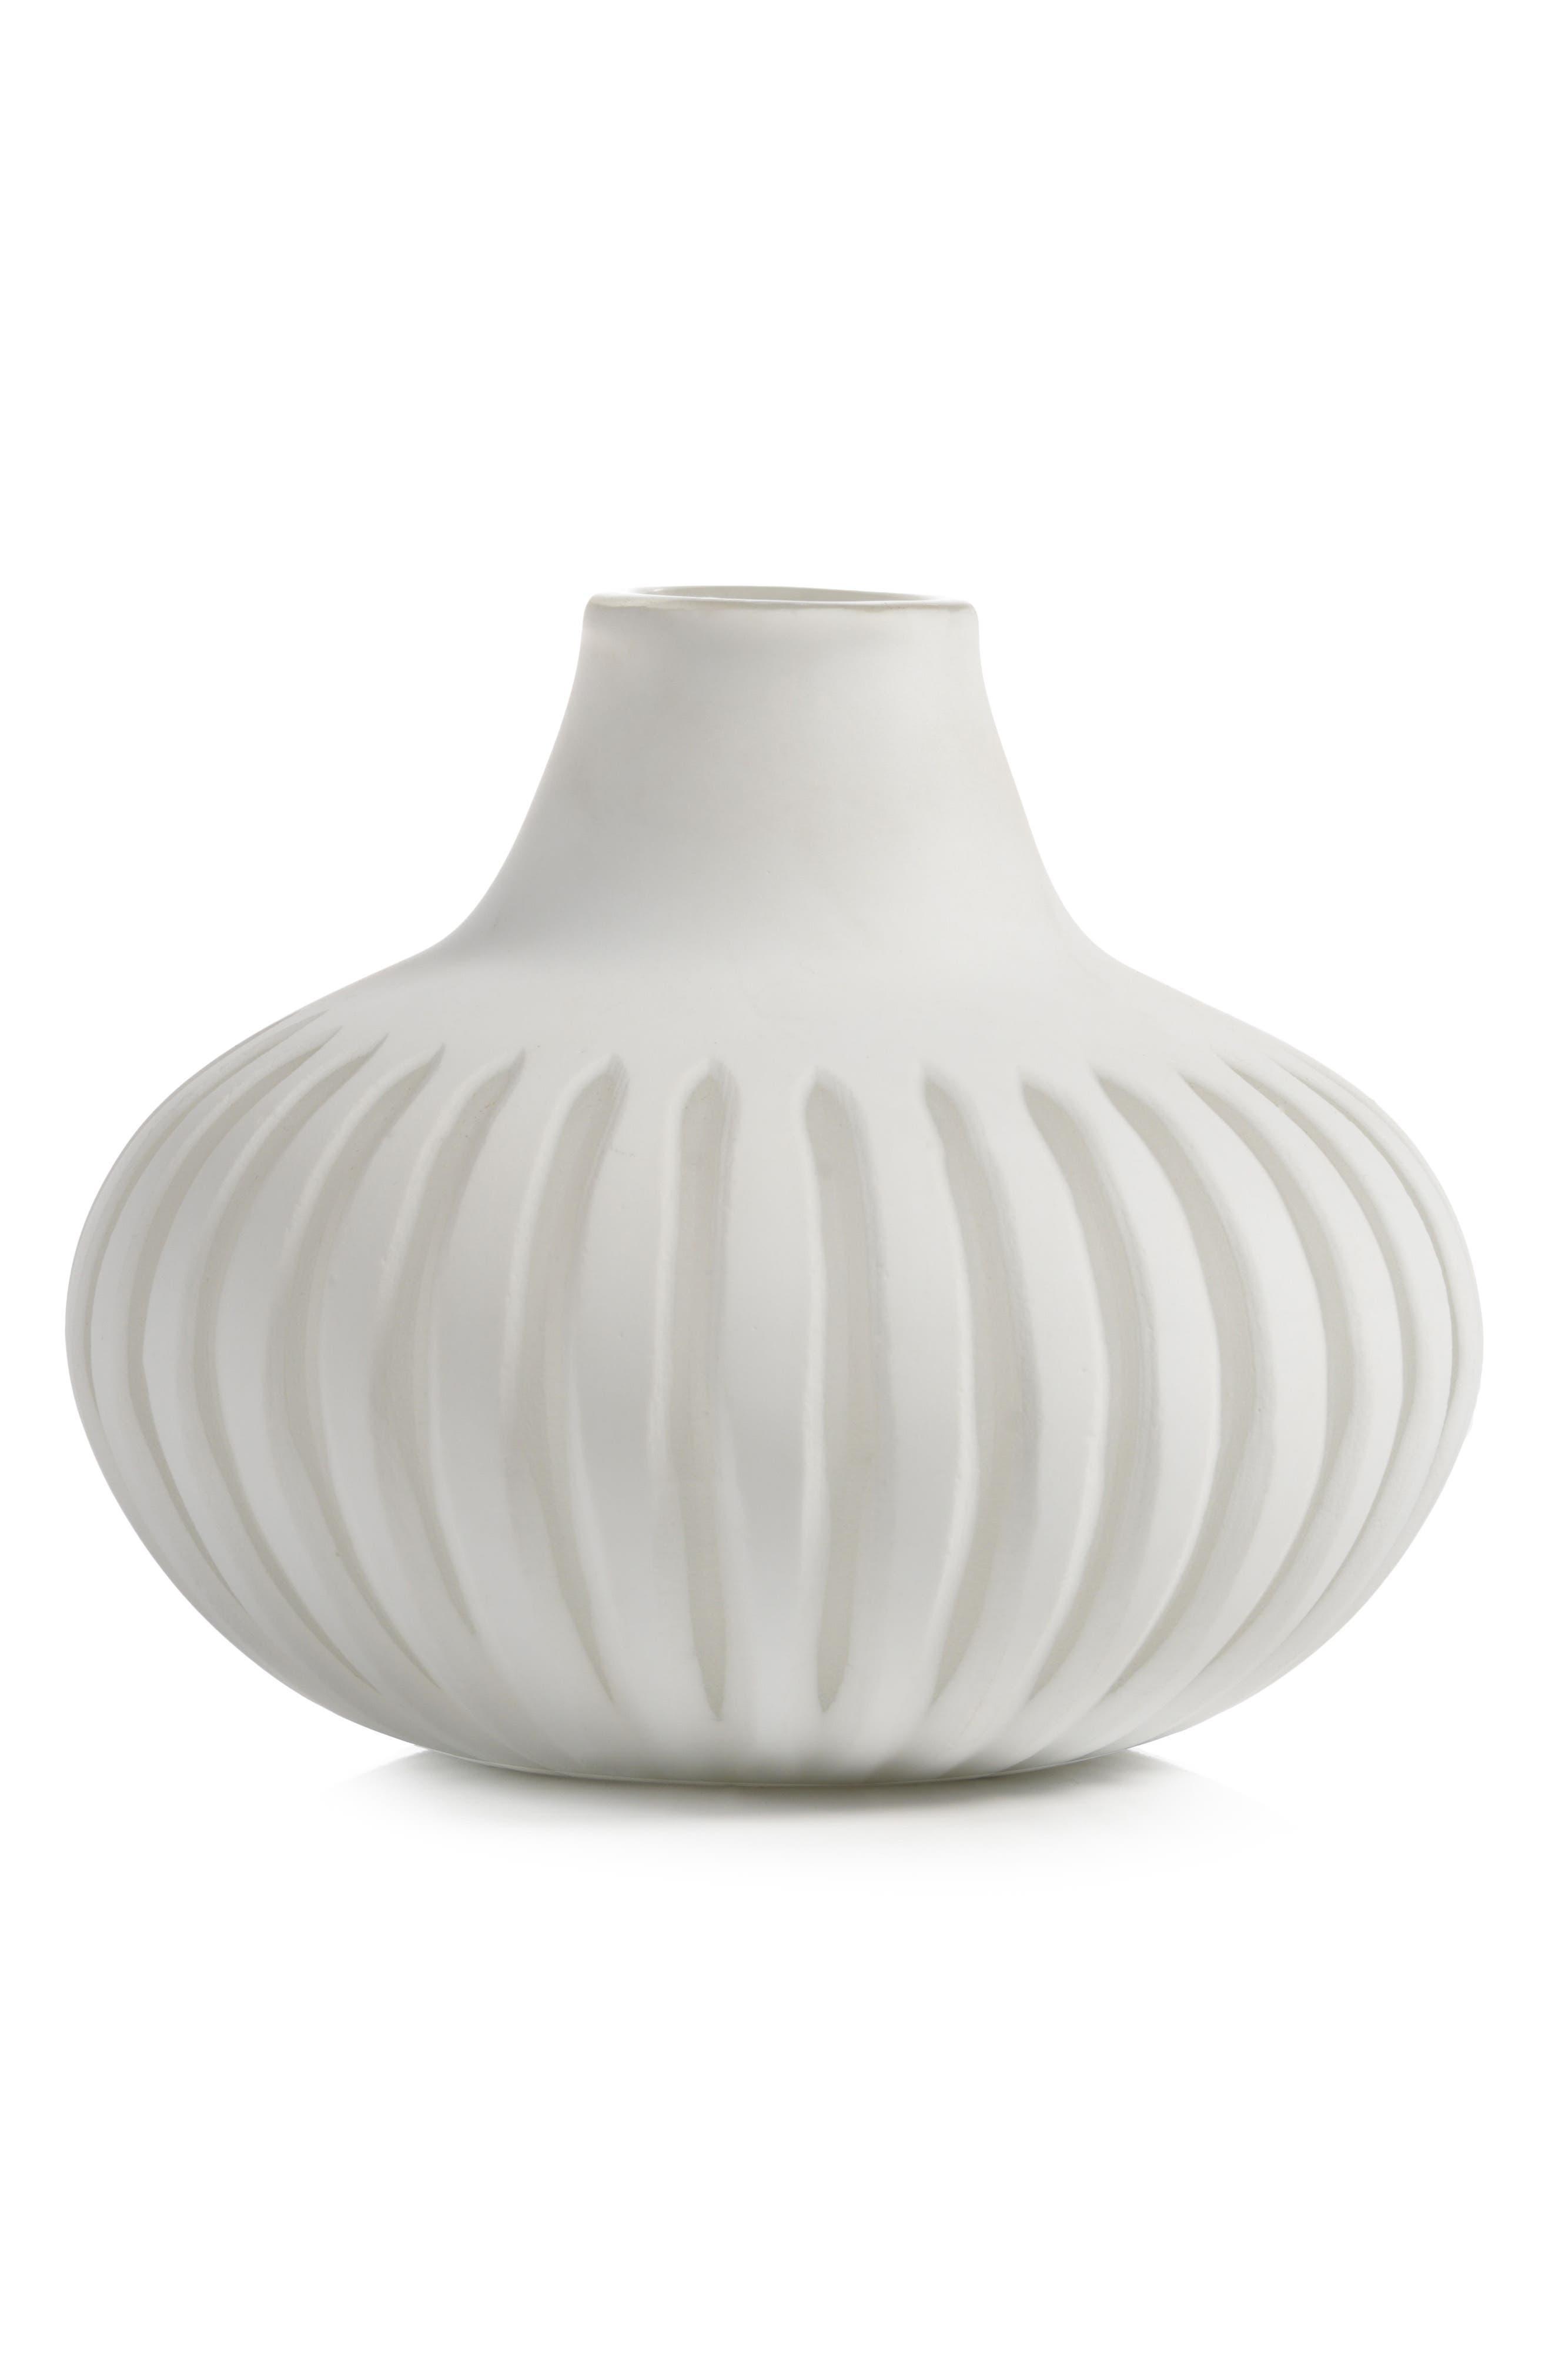 Sakana Glass Vase,                             Main thumbnail 1, color,                             100